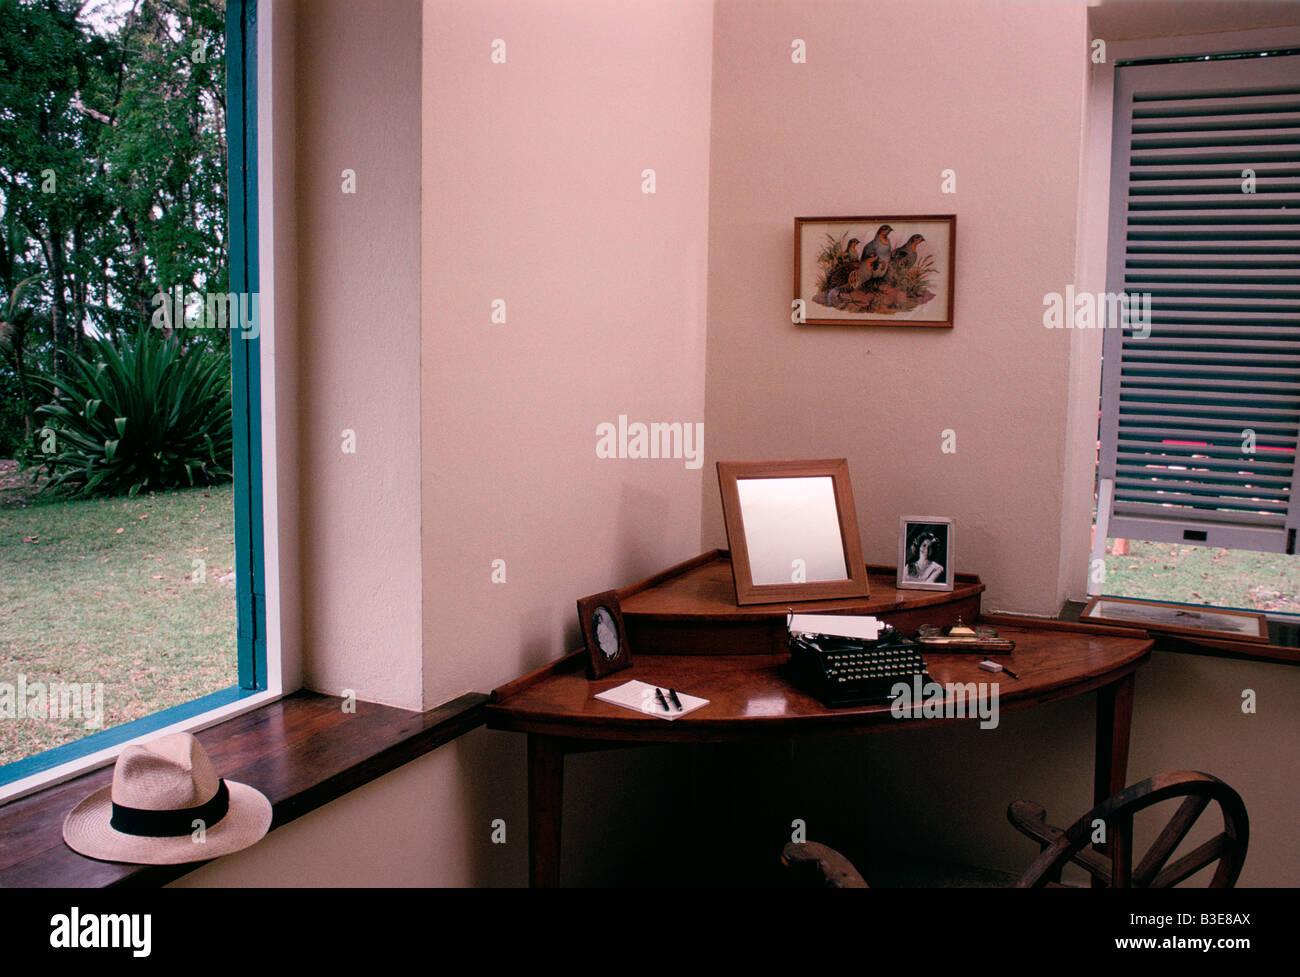 GOLDEN EYE IAN FLEMINGS HOUSE JAMAICA - Stock Image